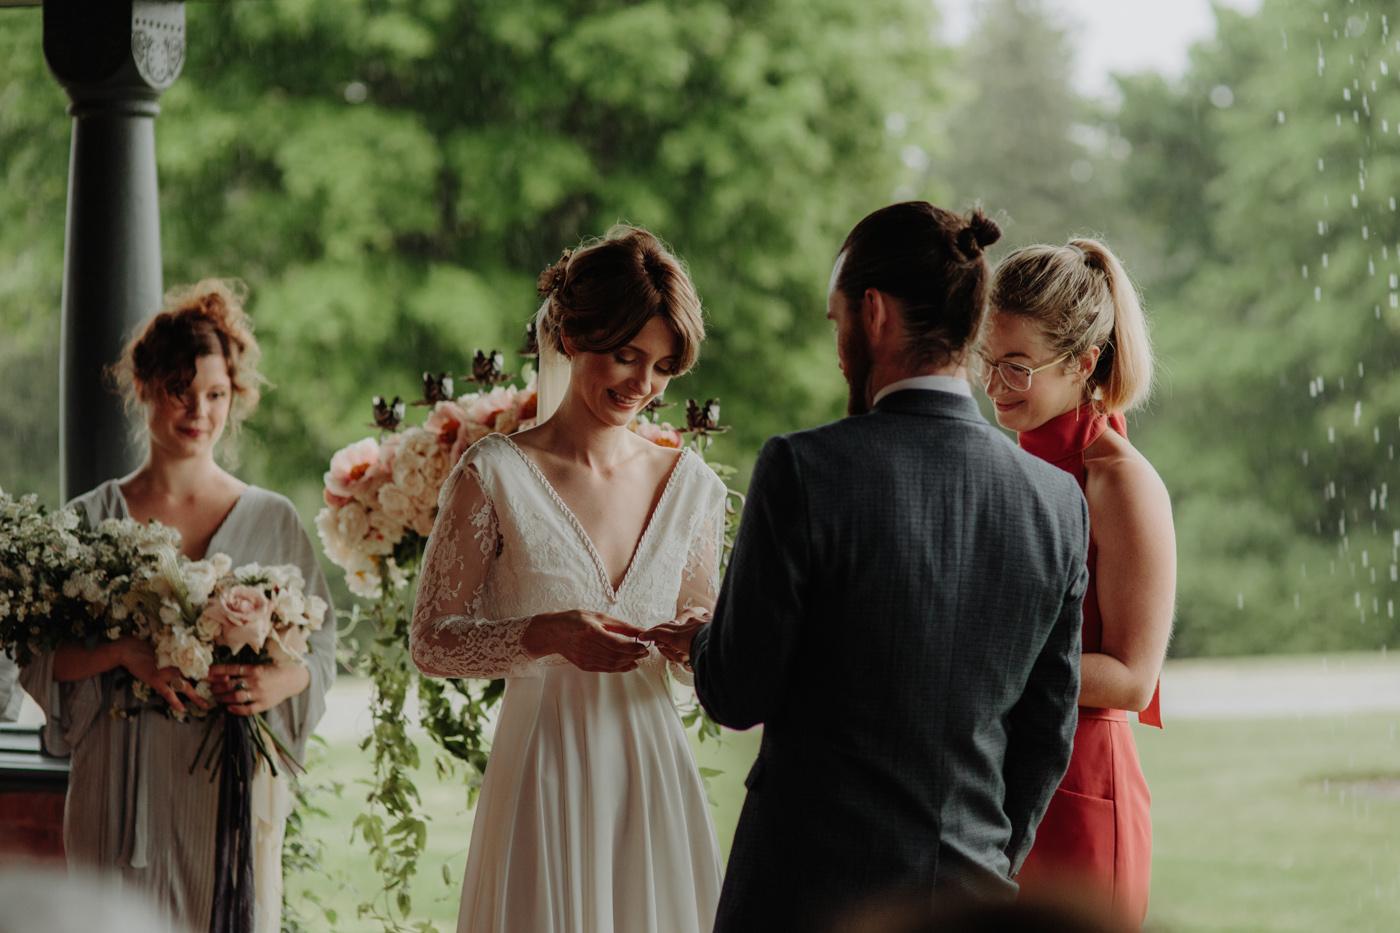 Erin-Mike-Intimate-Vintage-Wedding-Shelburne-Farms-Vermont -93.jpg